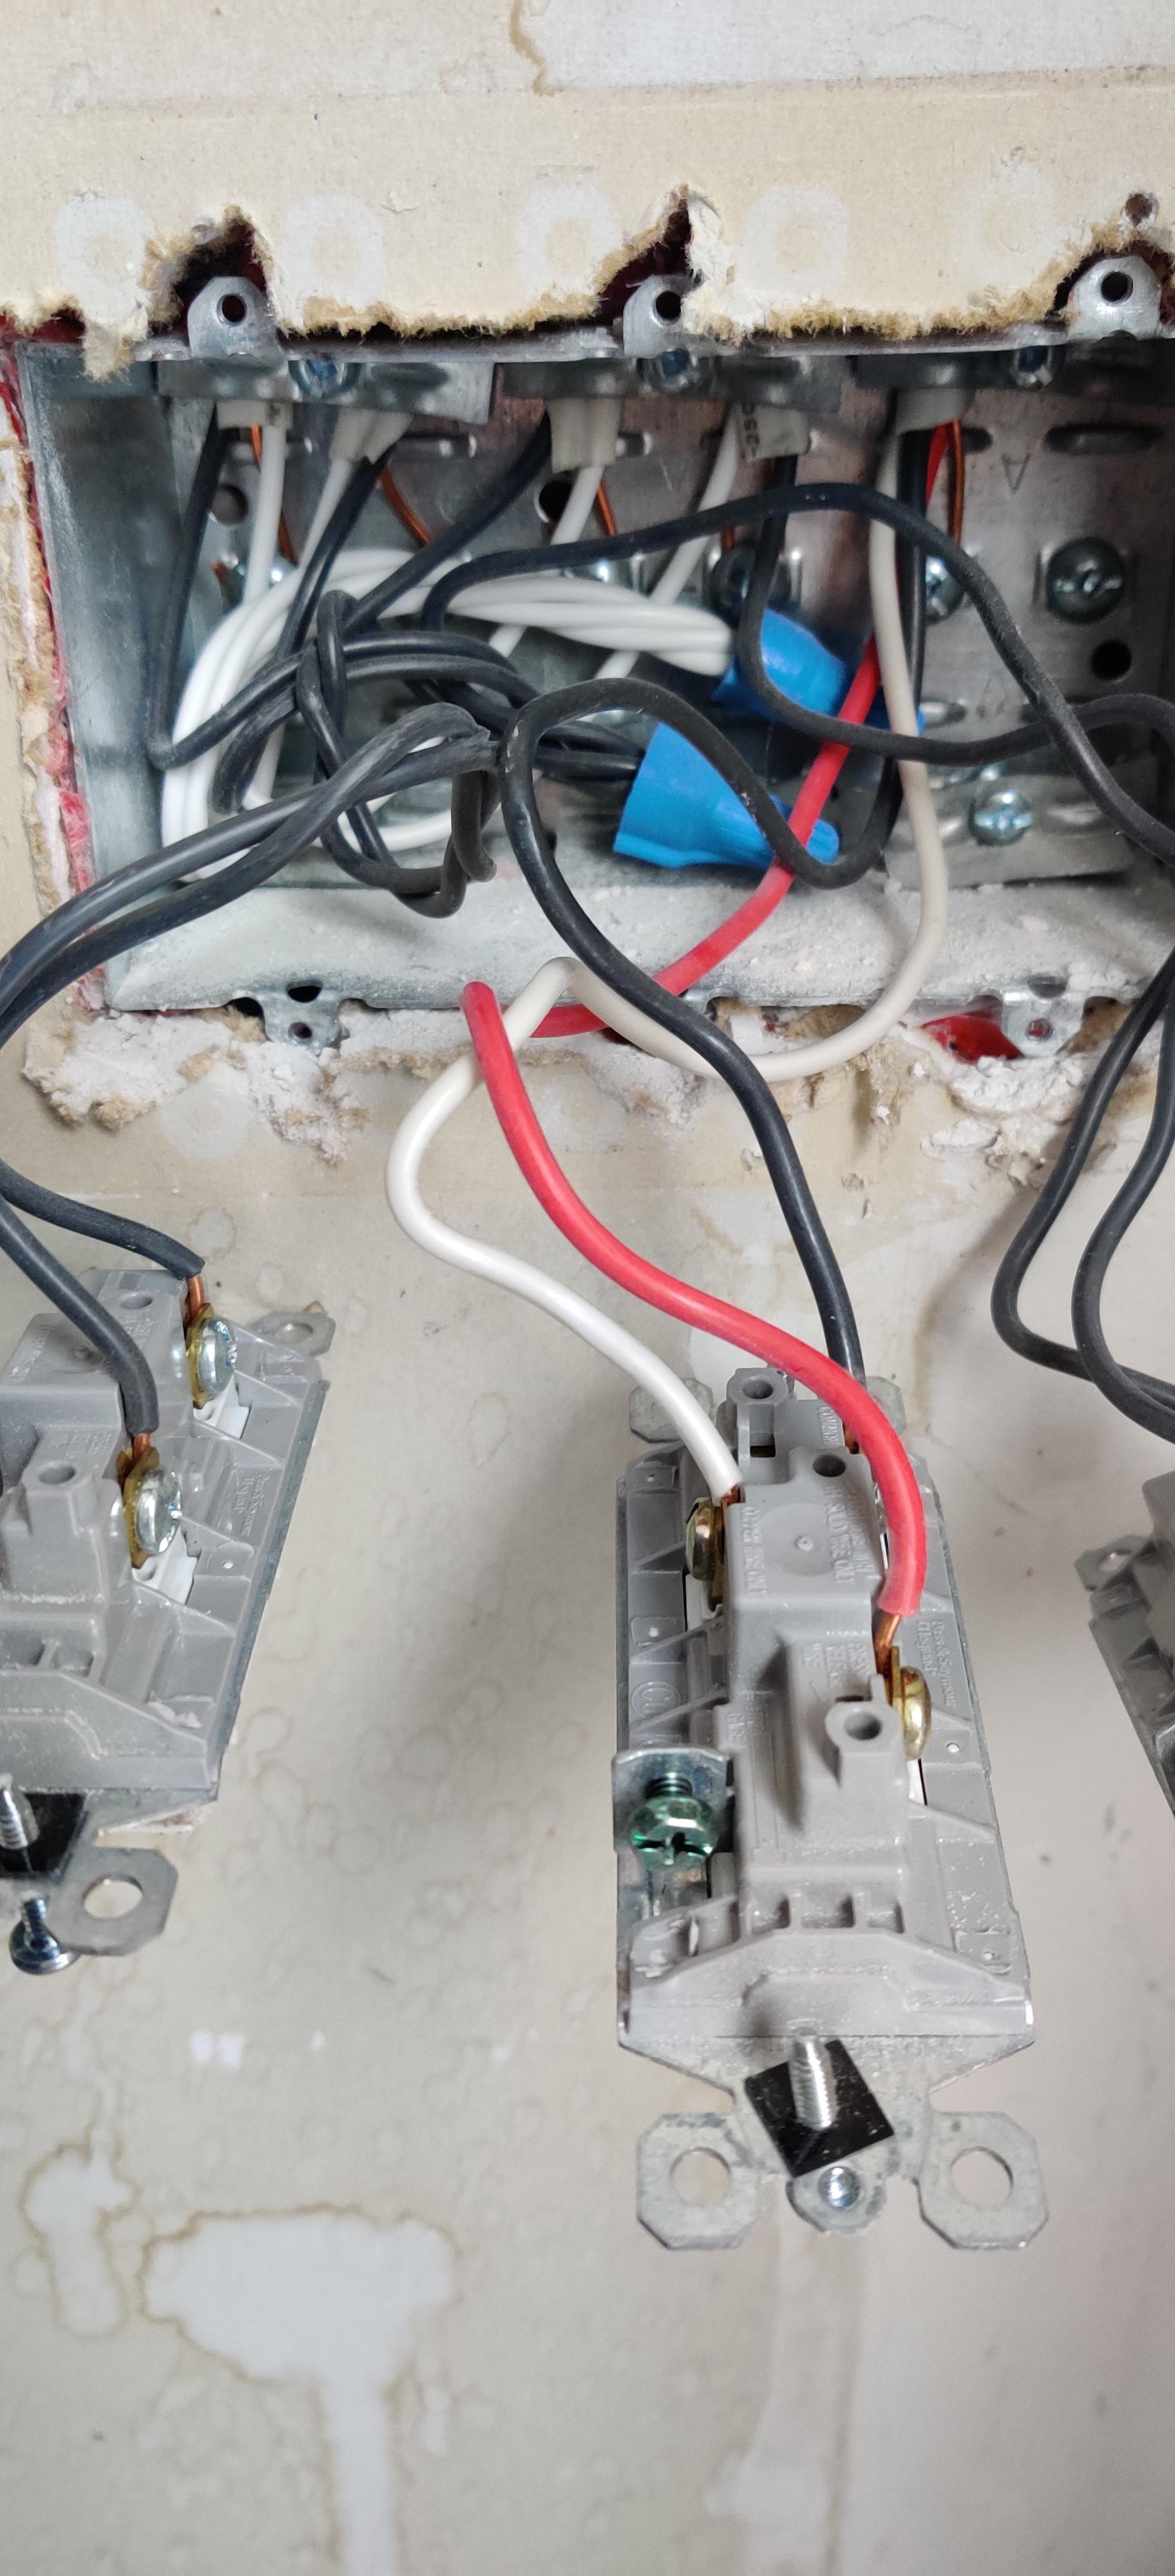 Lzw30-sn 4-way Wiring Help - Wiring Help